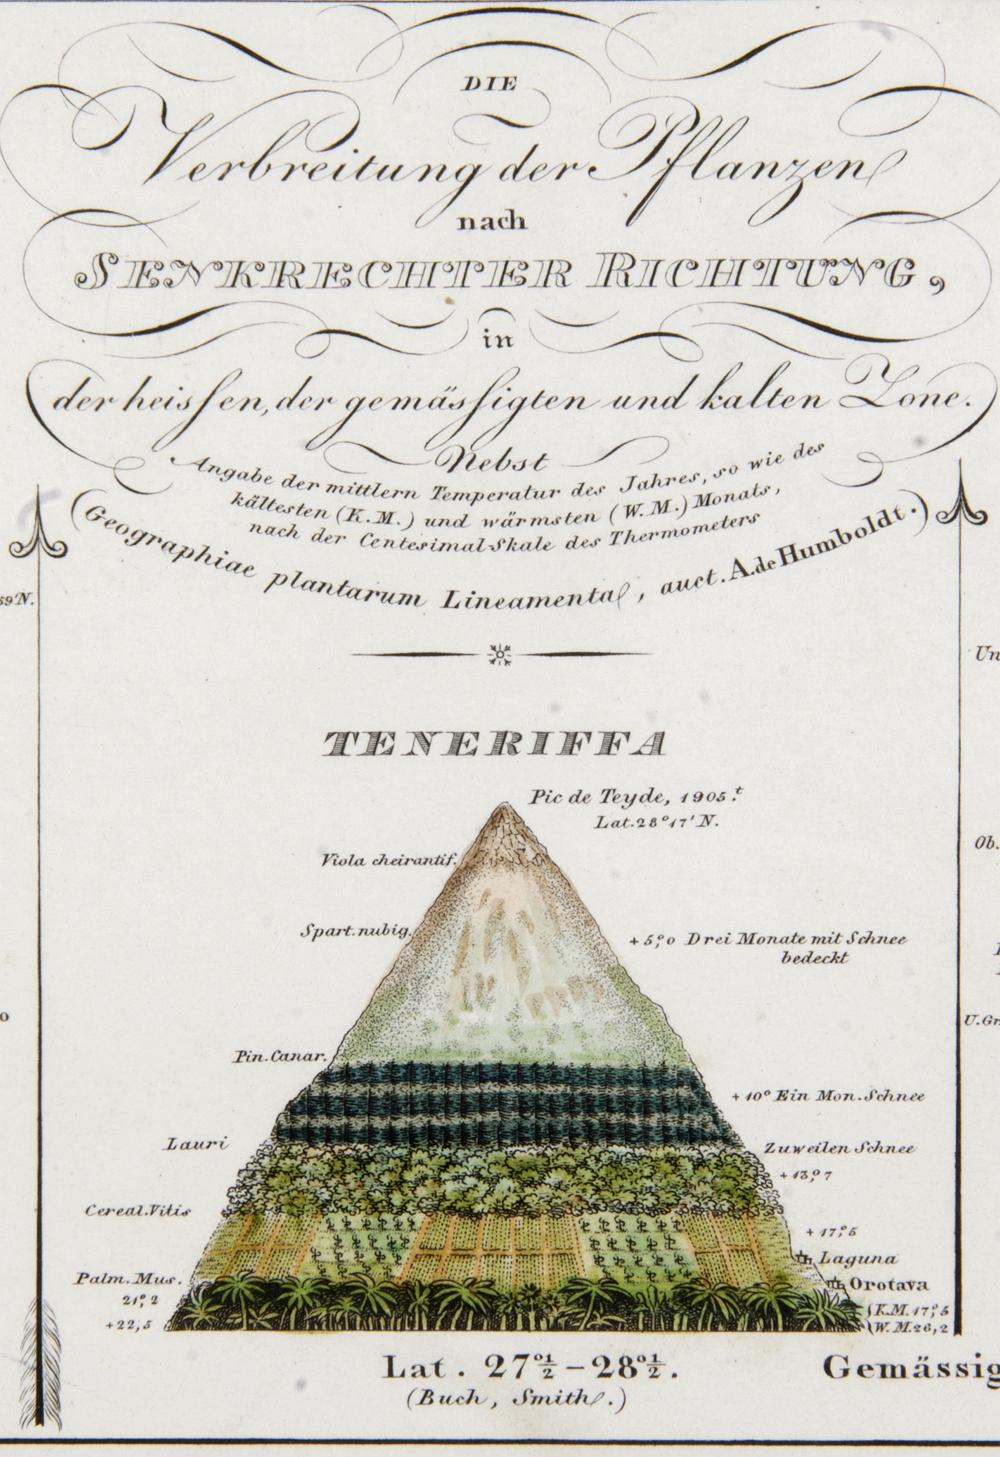 H. Berghaus, 1851, Physikalischer Atlas - Teneriffa